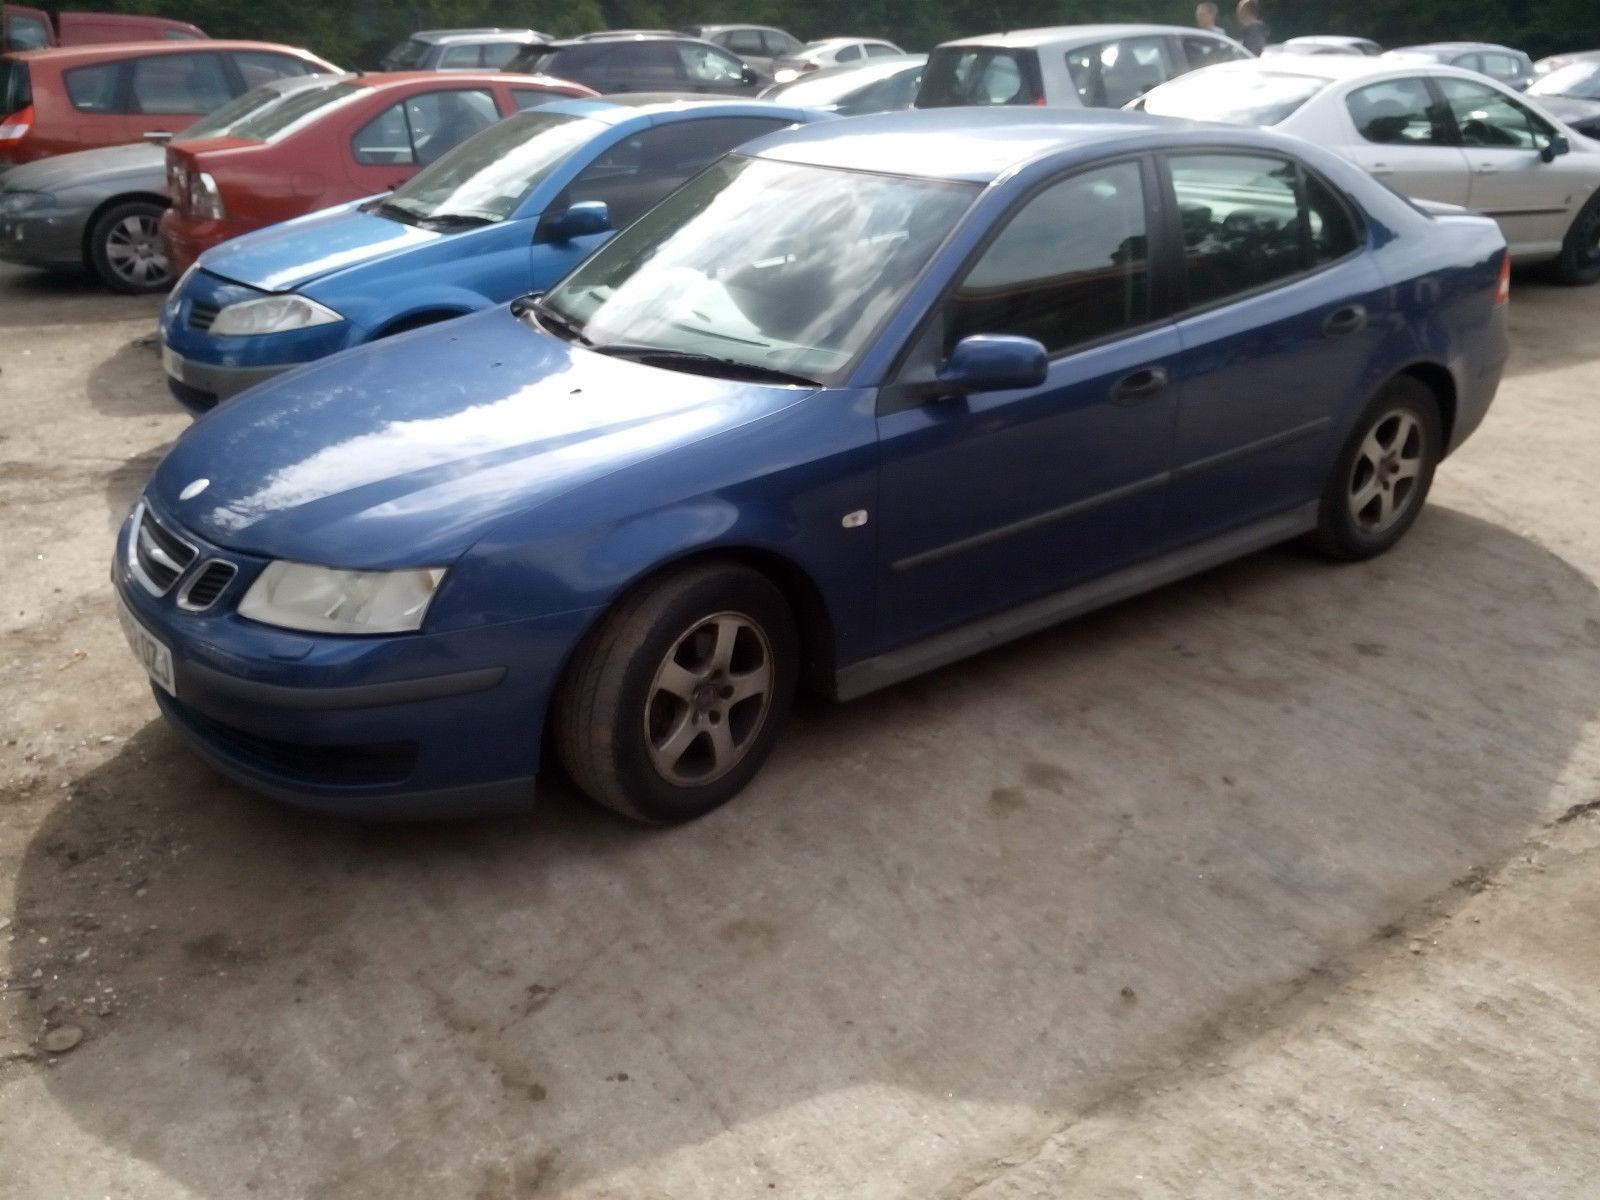 Need A Car Sudbury >> SAAB 9-3 LINEAR 2.0 LINEAR 150 BHP TURBO IN BLUE PASSENGER ...